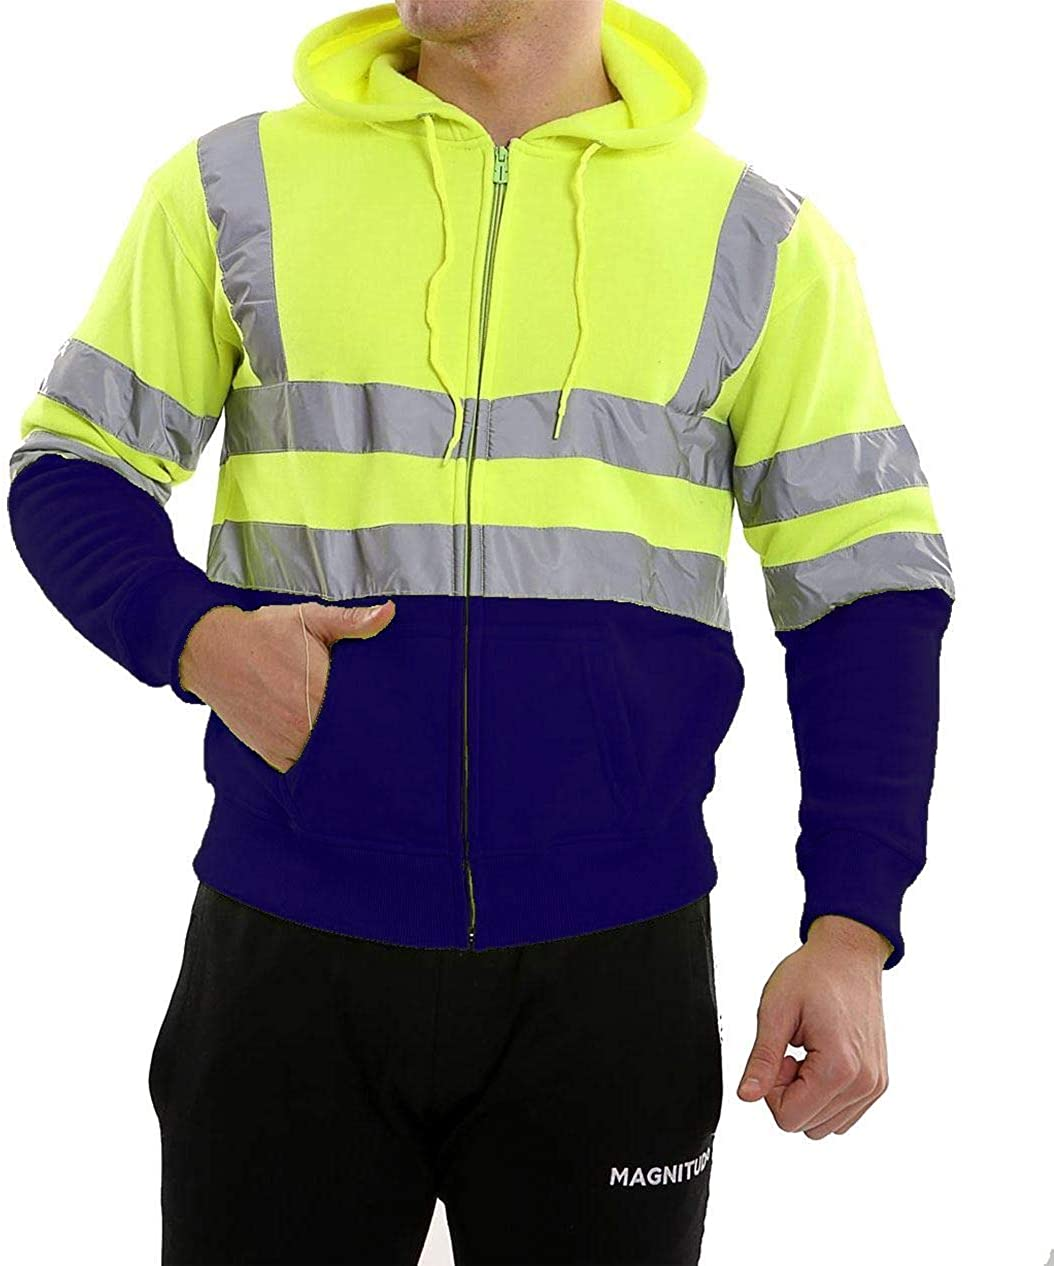 RIDDLED WITH STYLE Hi Vis Viz High Visibility Jacket Men Zip Up Reflective Fleece Hoodie Sweatshirt